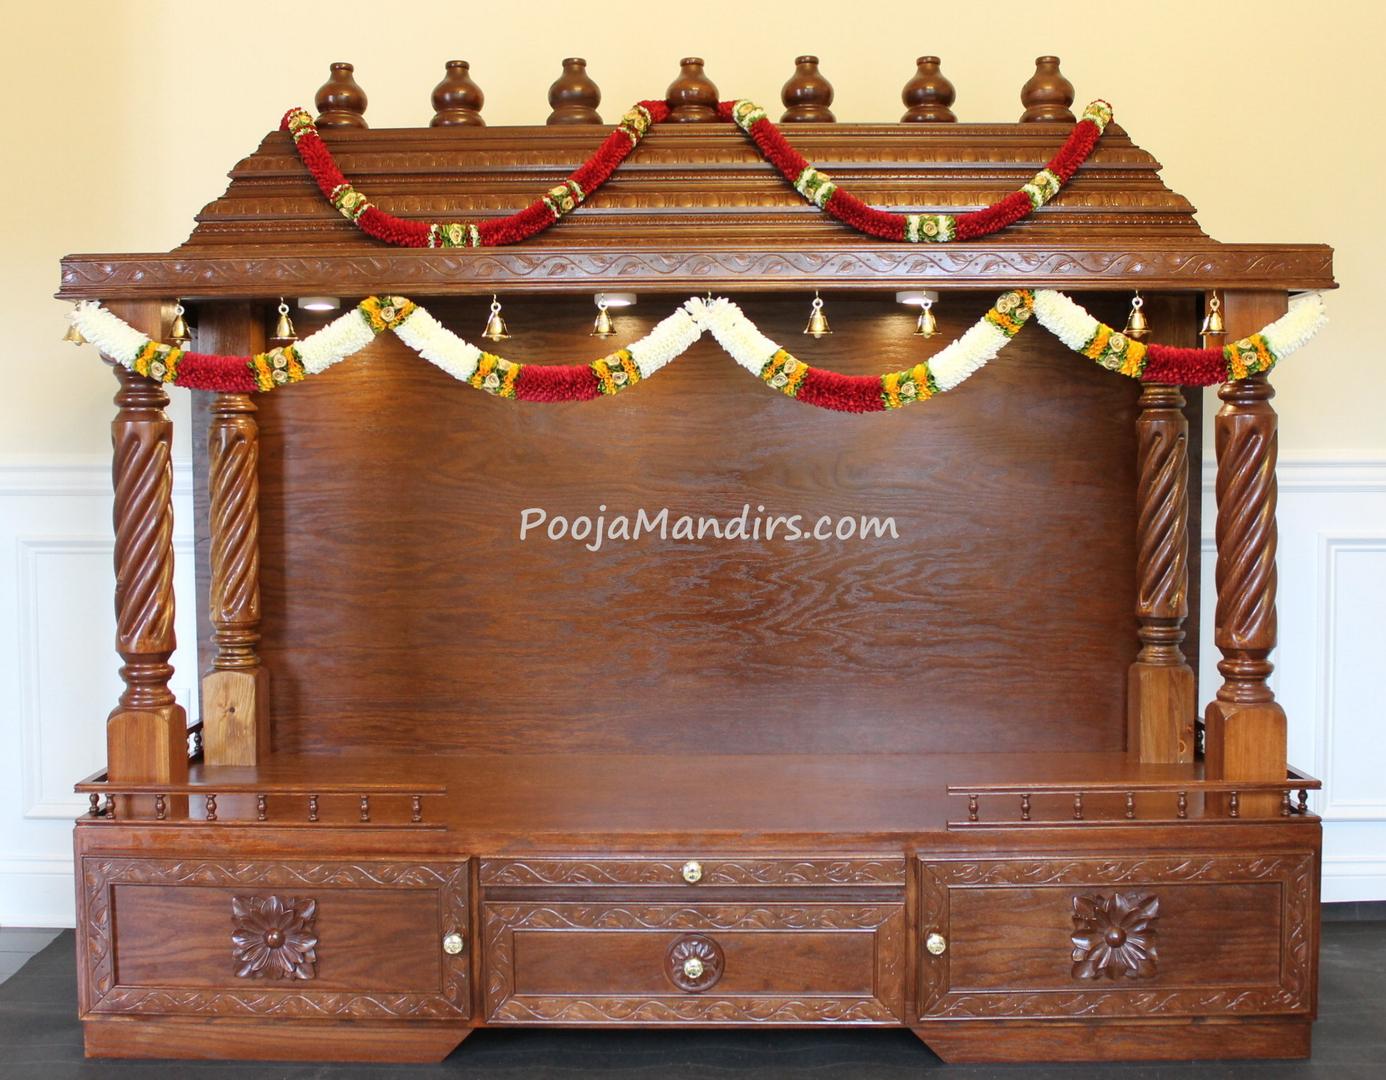 Big Wooden Pooja Mandir Designs For Home Home Plan